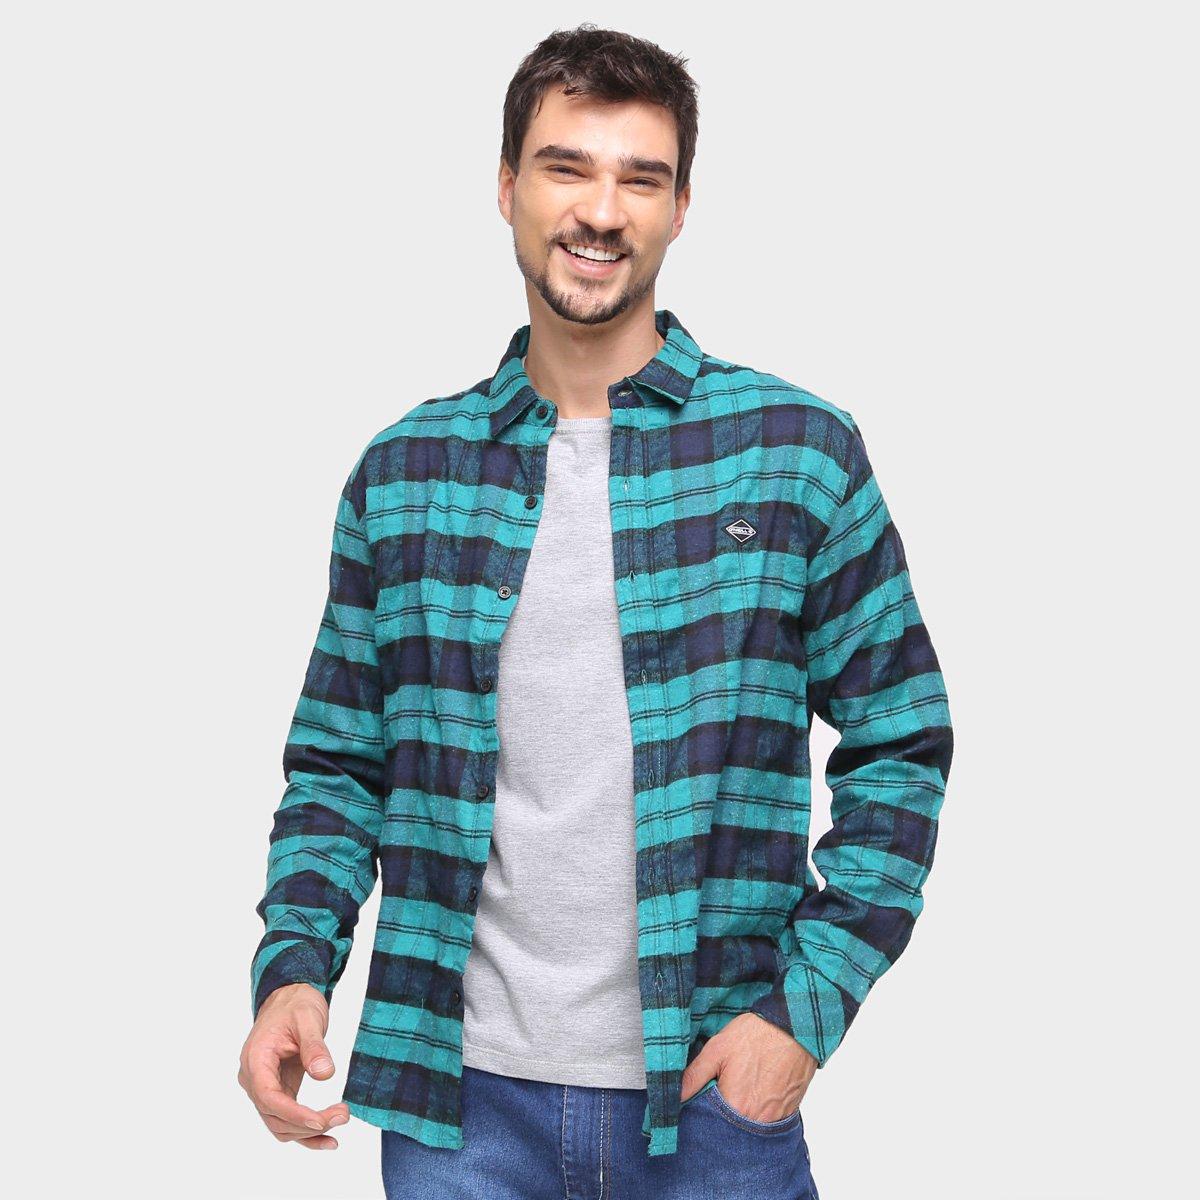 Camisa Xadrez O'neill Flanela Manga Longa Masculina